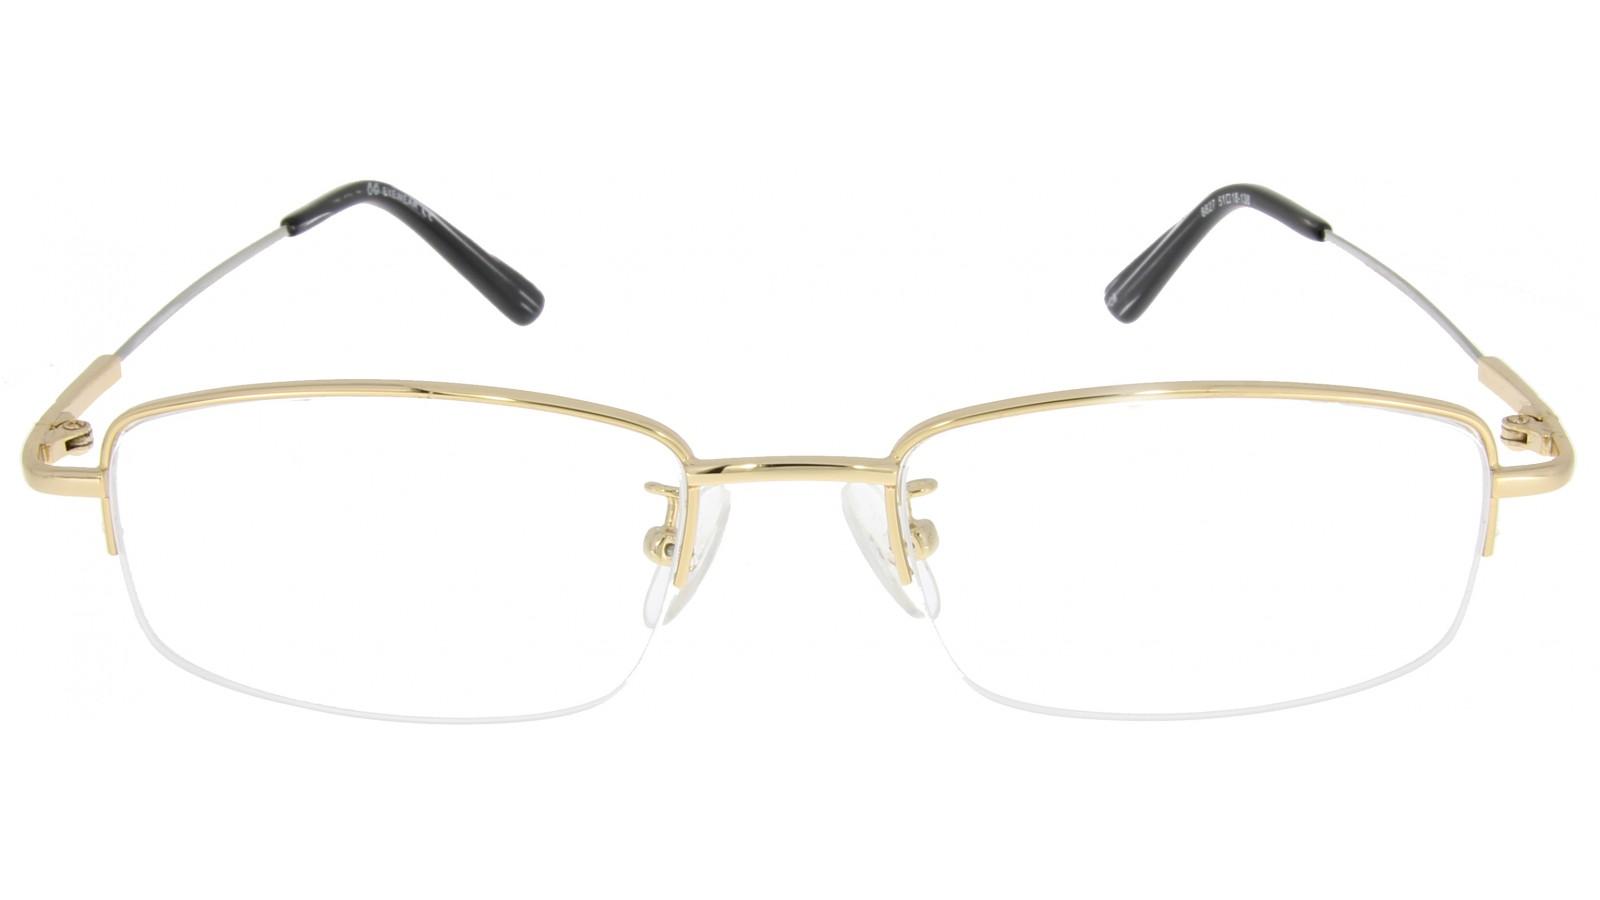 Halbrandbrille aus Metall - Flexible Brillenbügel